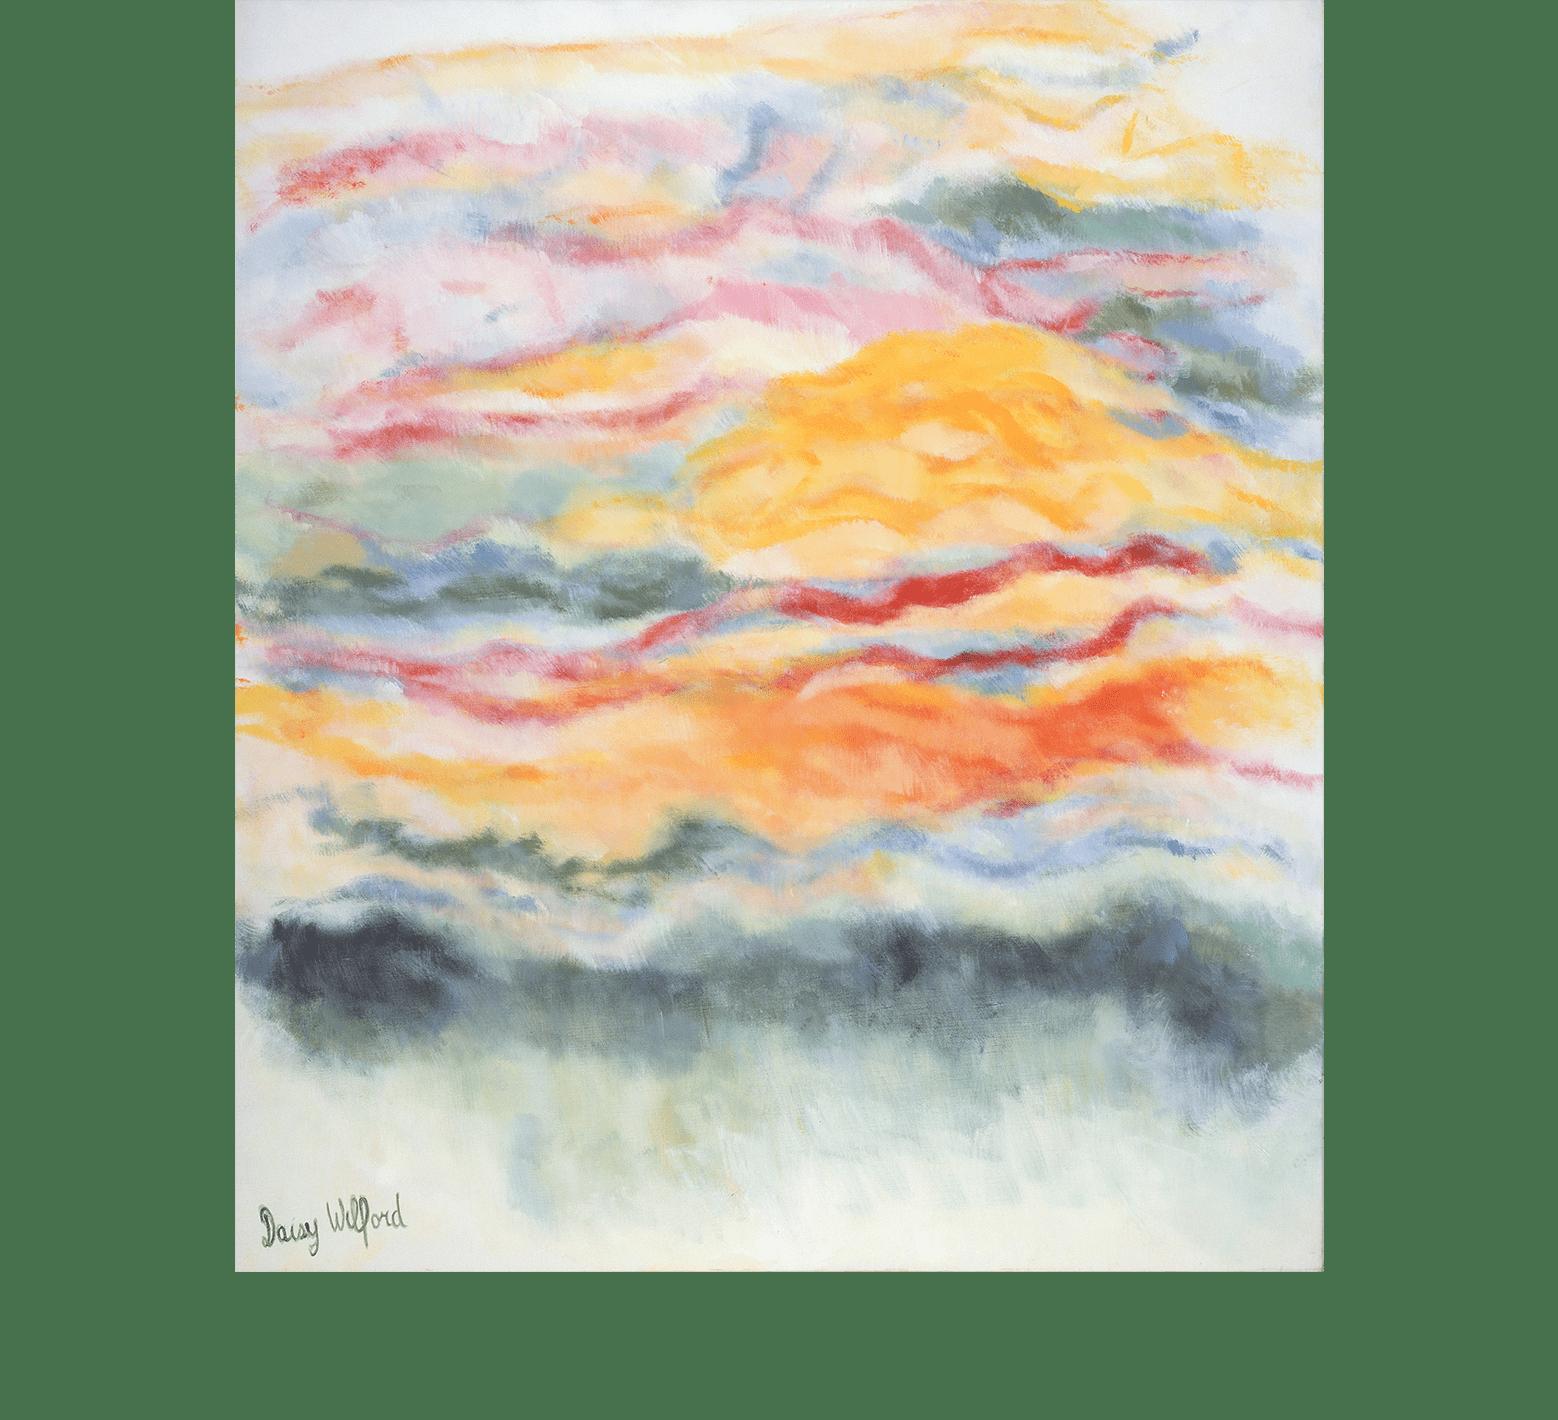 Nuage, soleil, mer (1987-1988)